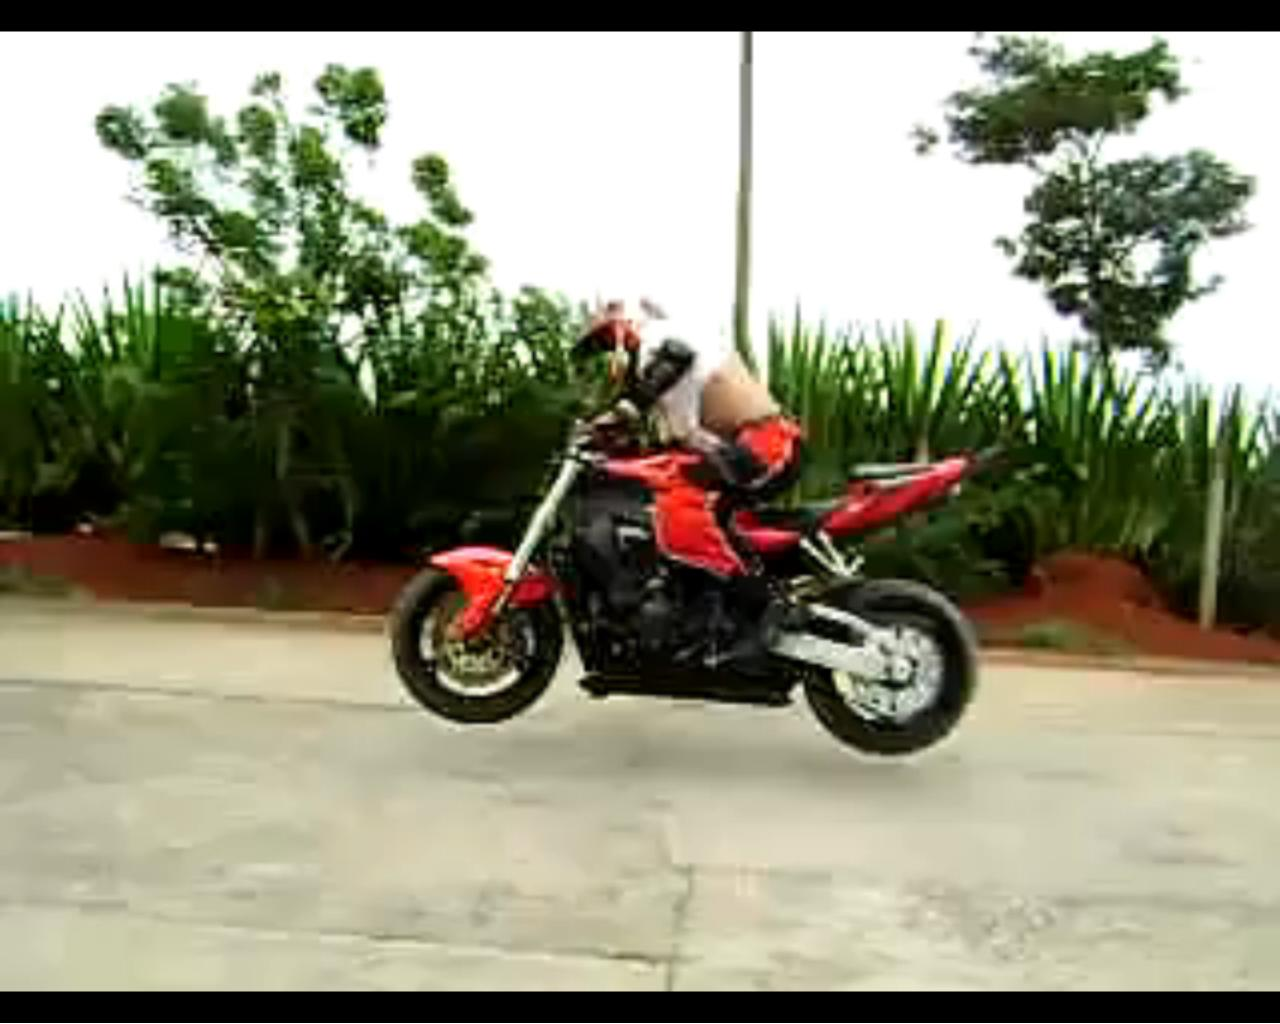 Las motos son bicicletas.